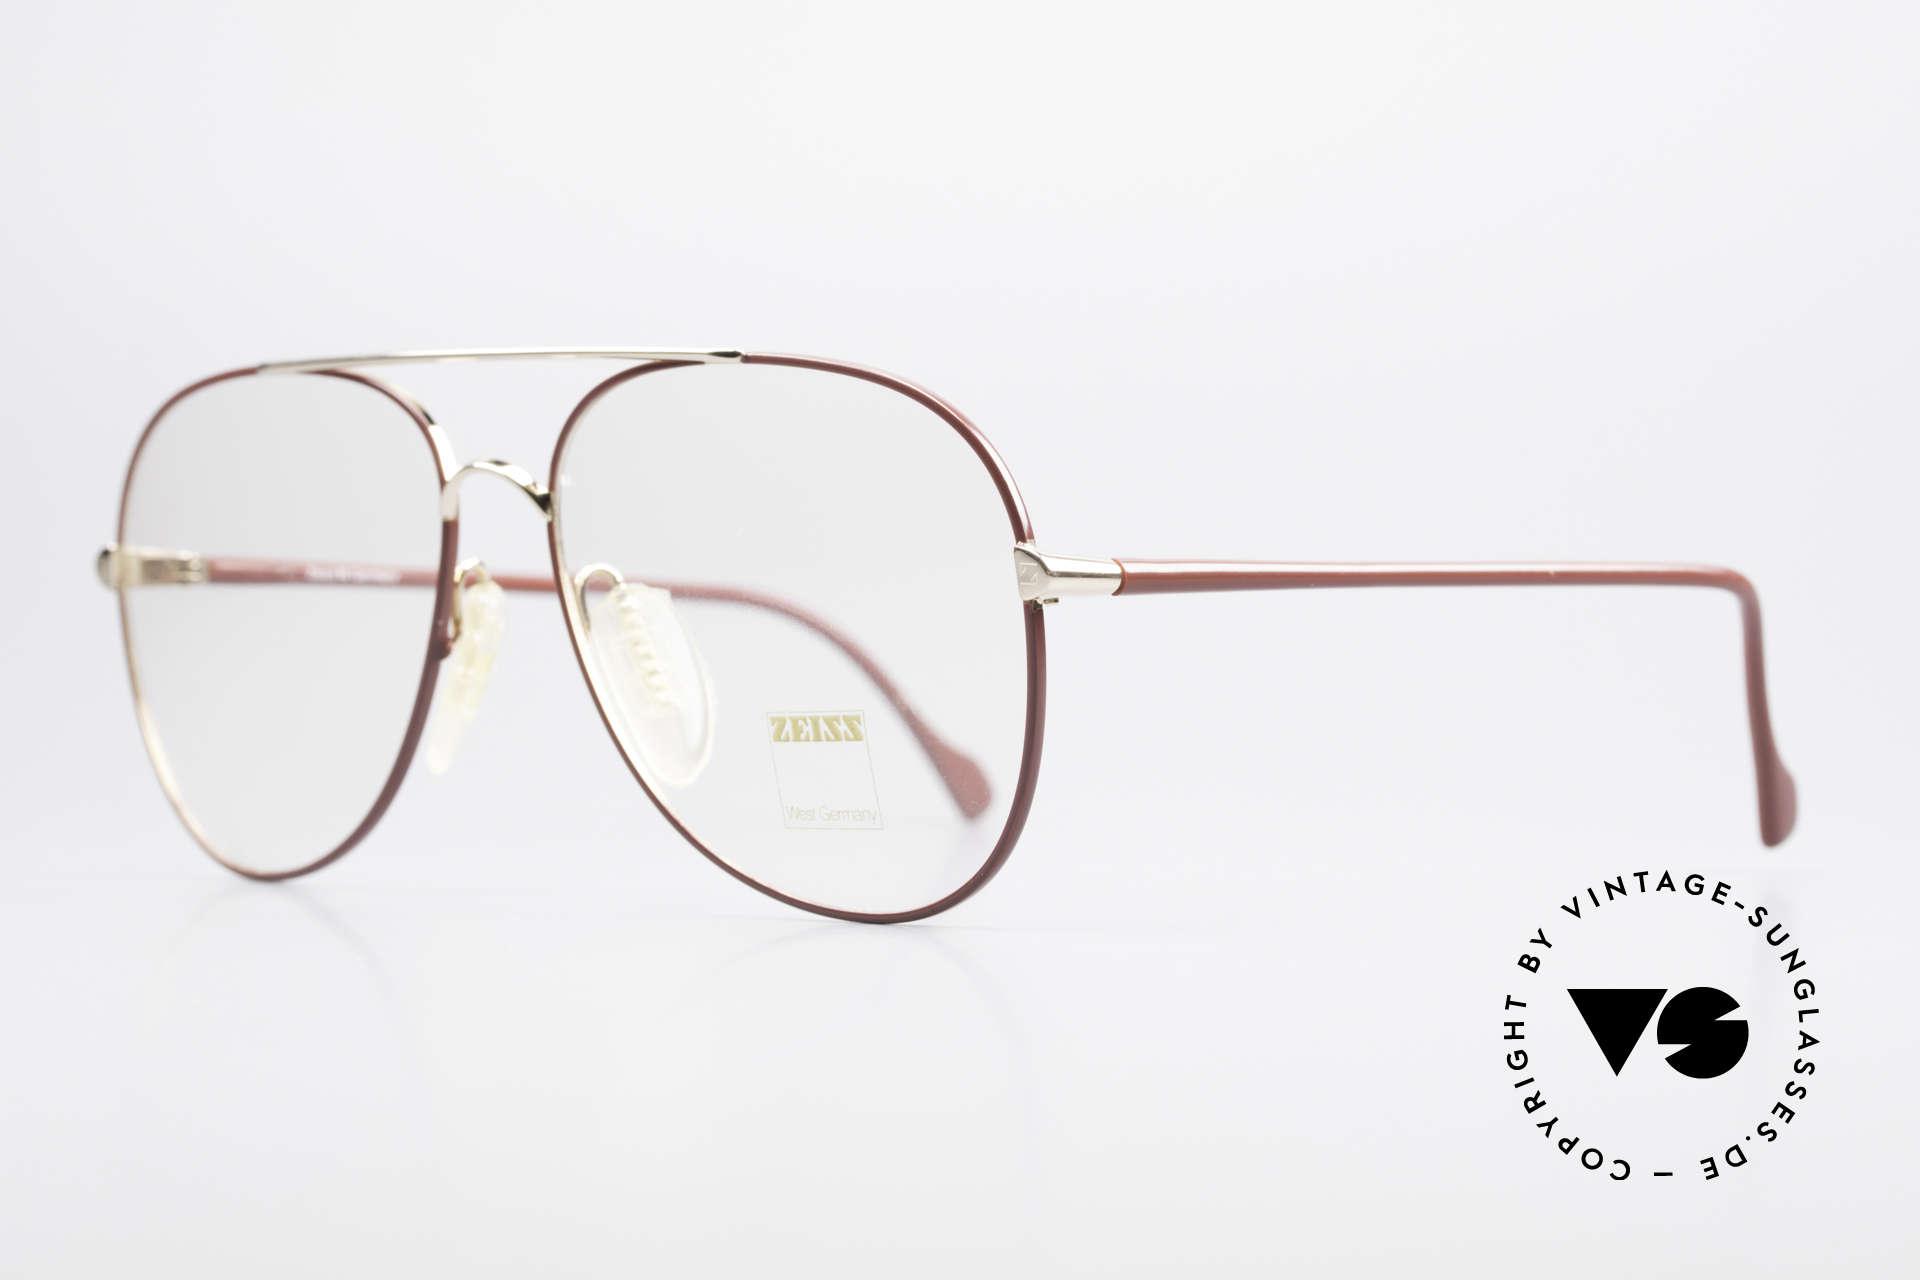 Zeiss 5882 Old 80's Eyeglass-Frame Men, monolithic design (built to last) You must feel this!, Made for Men